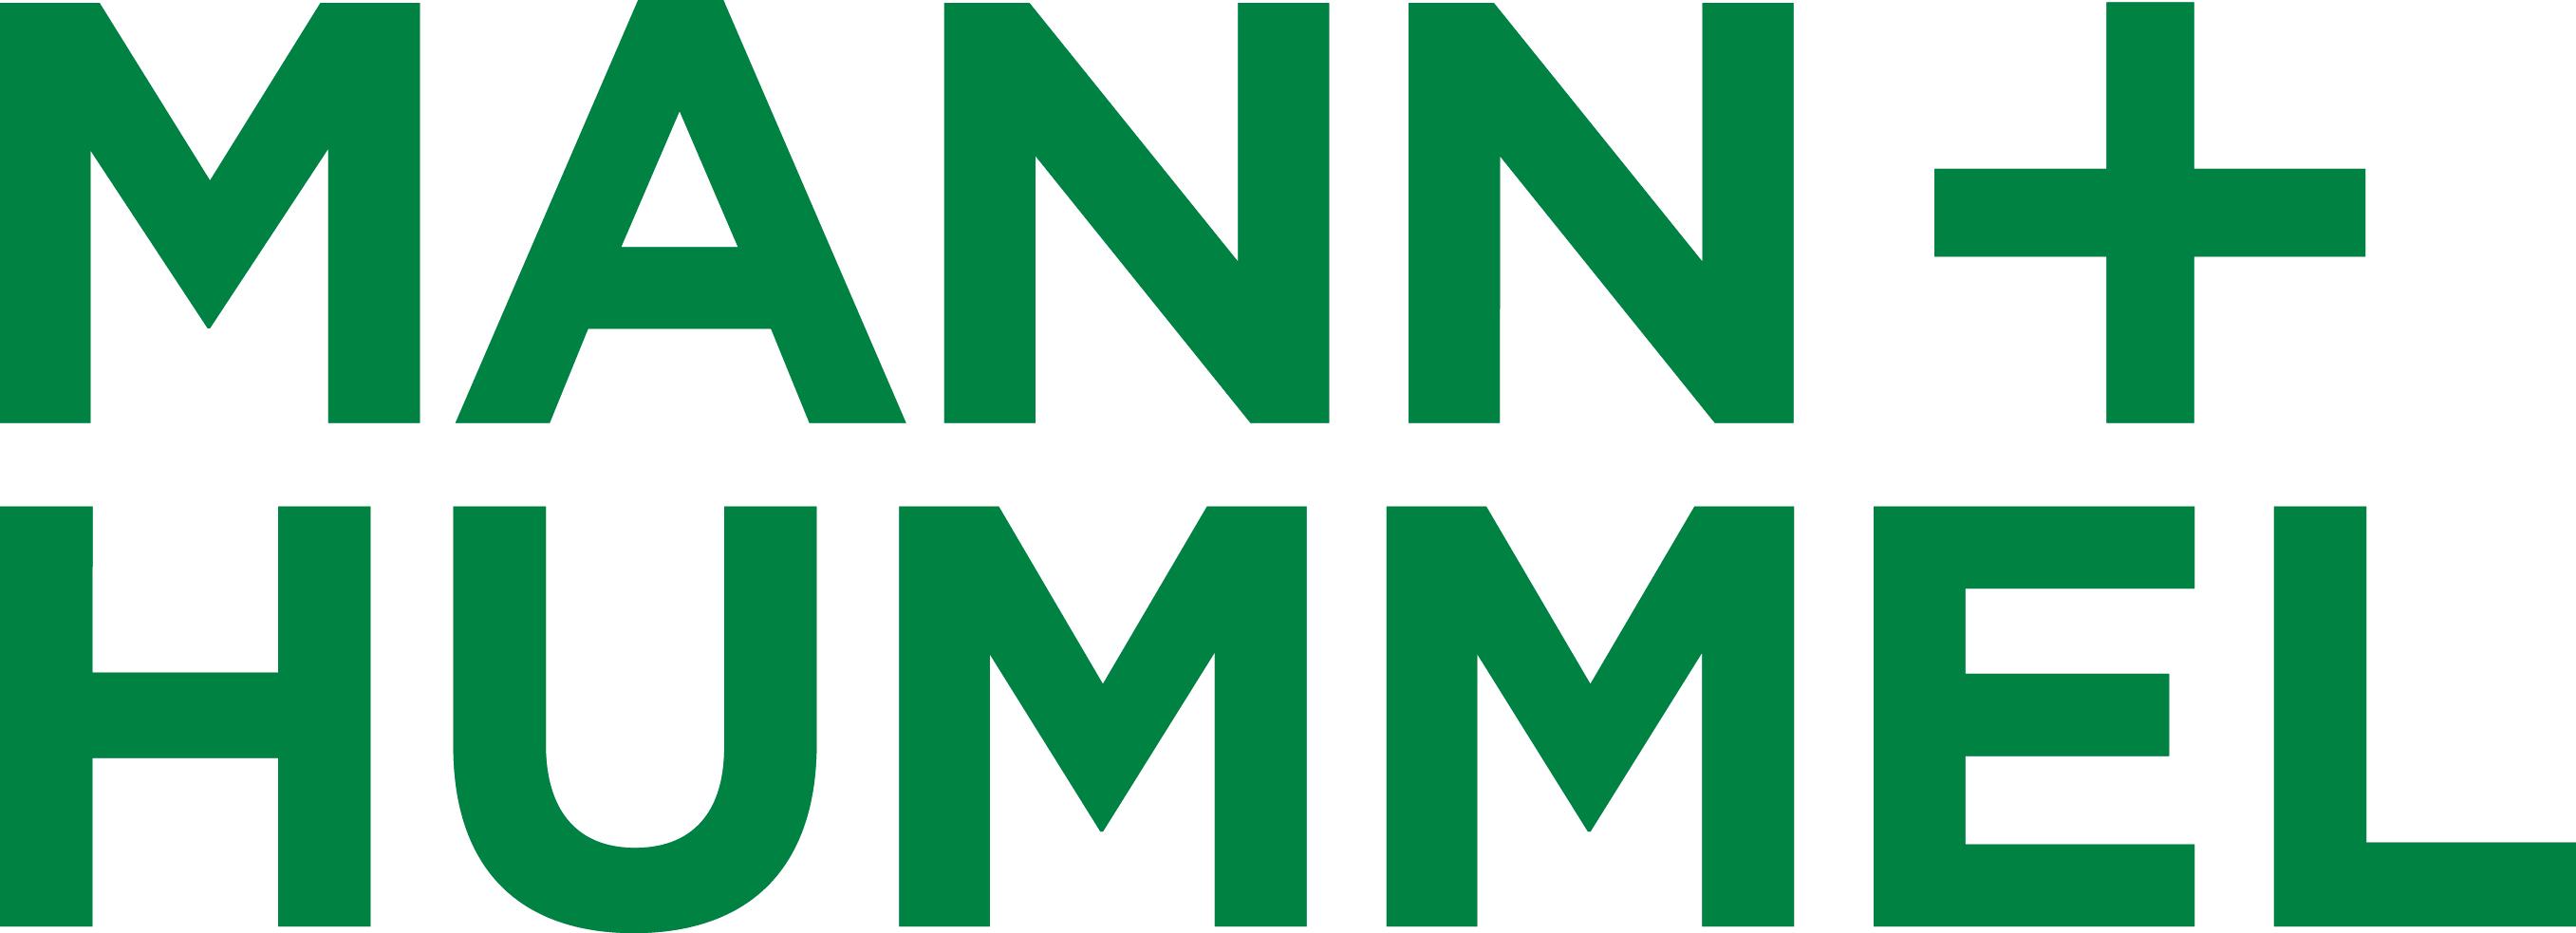 ArtiMinds-Robotics-Mann-und-Hummel-robotergestütztes-Bin-Picking